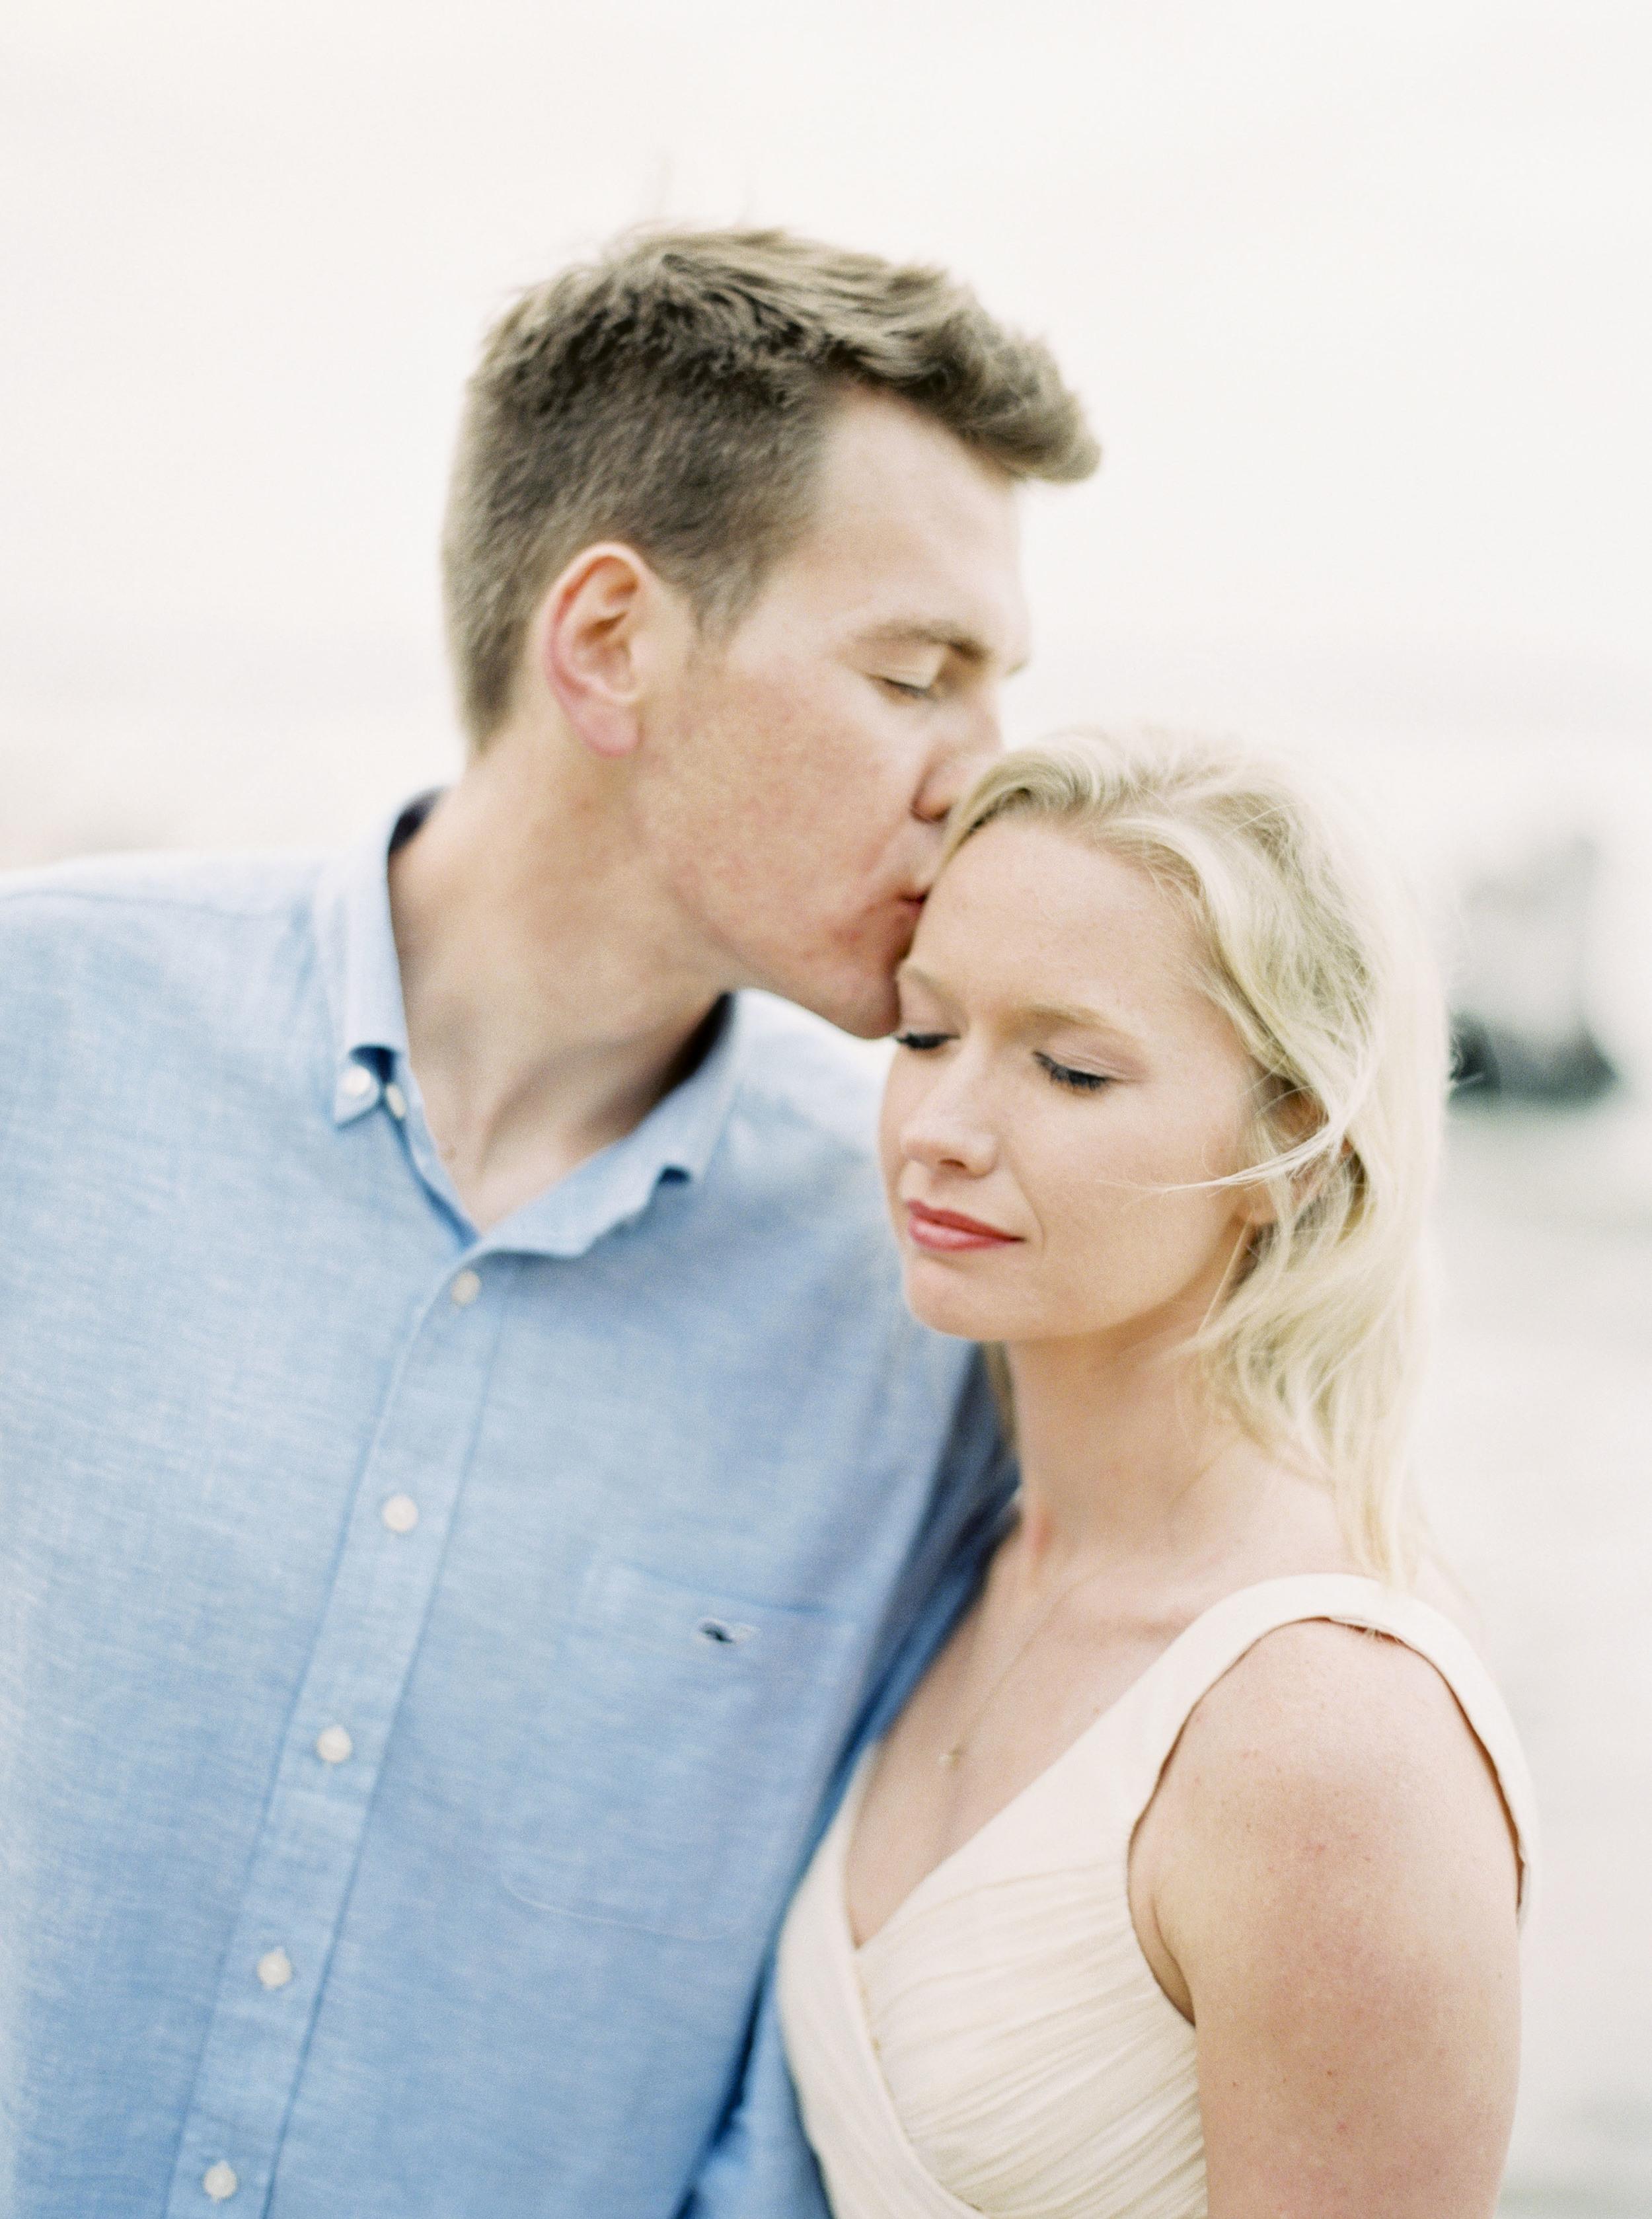 Little Talbot Island Engagement Session, Amanda Lenhardt Photography Dallas, Austin, and Destination